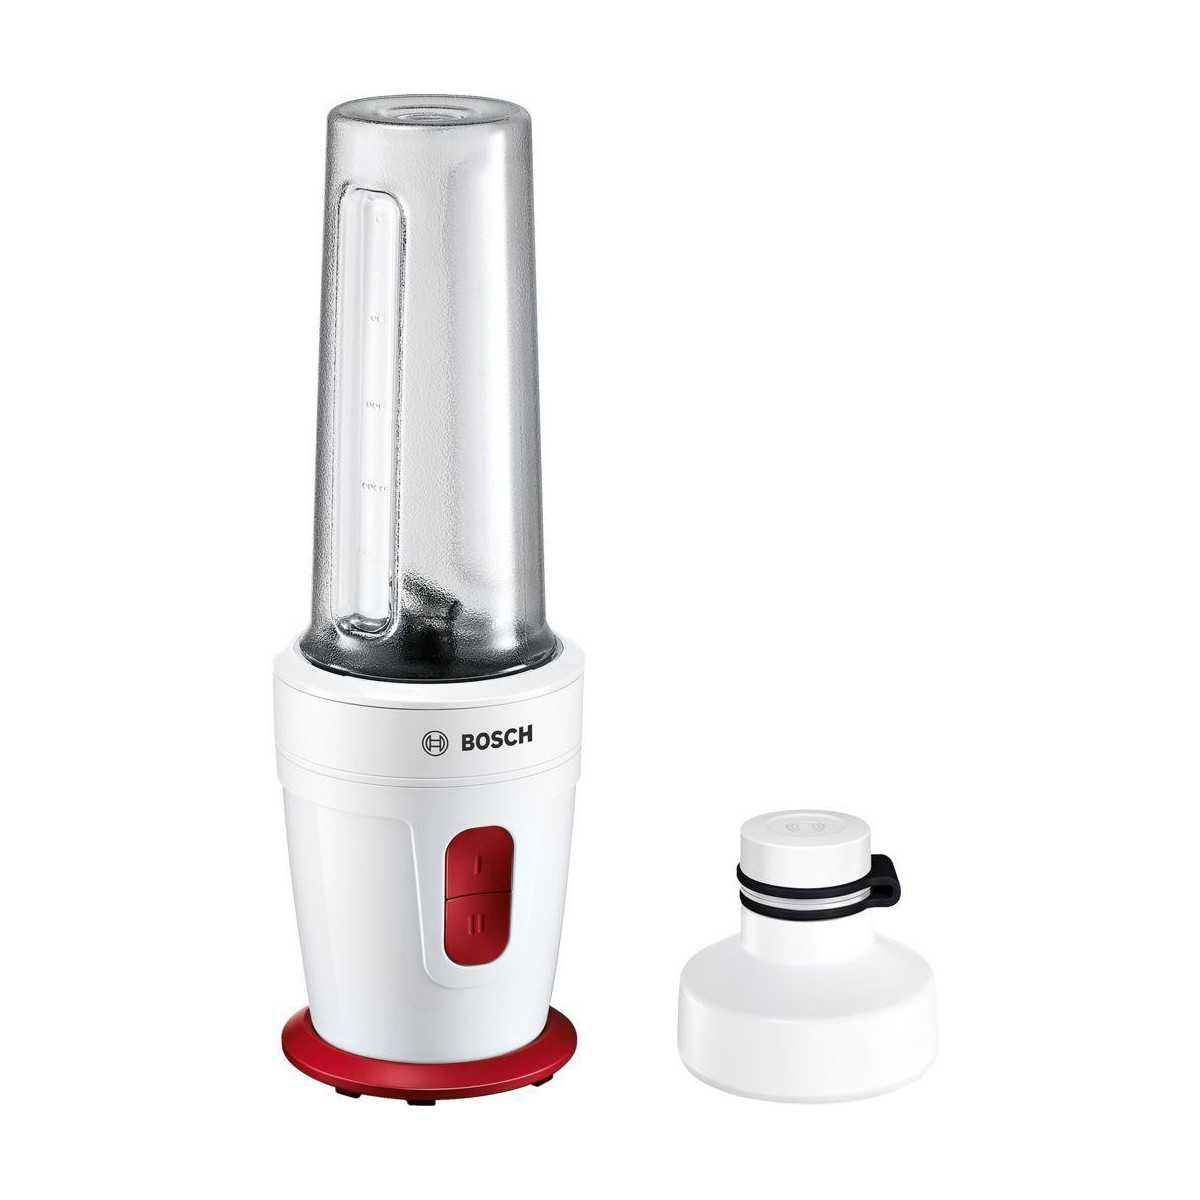 Batidora vaso Bosch Pae MMBP1000 - 1